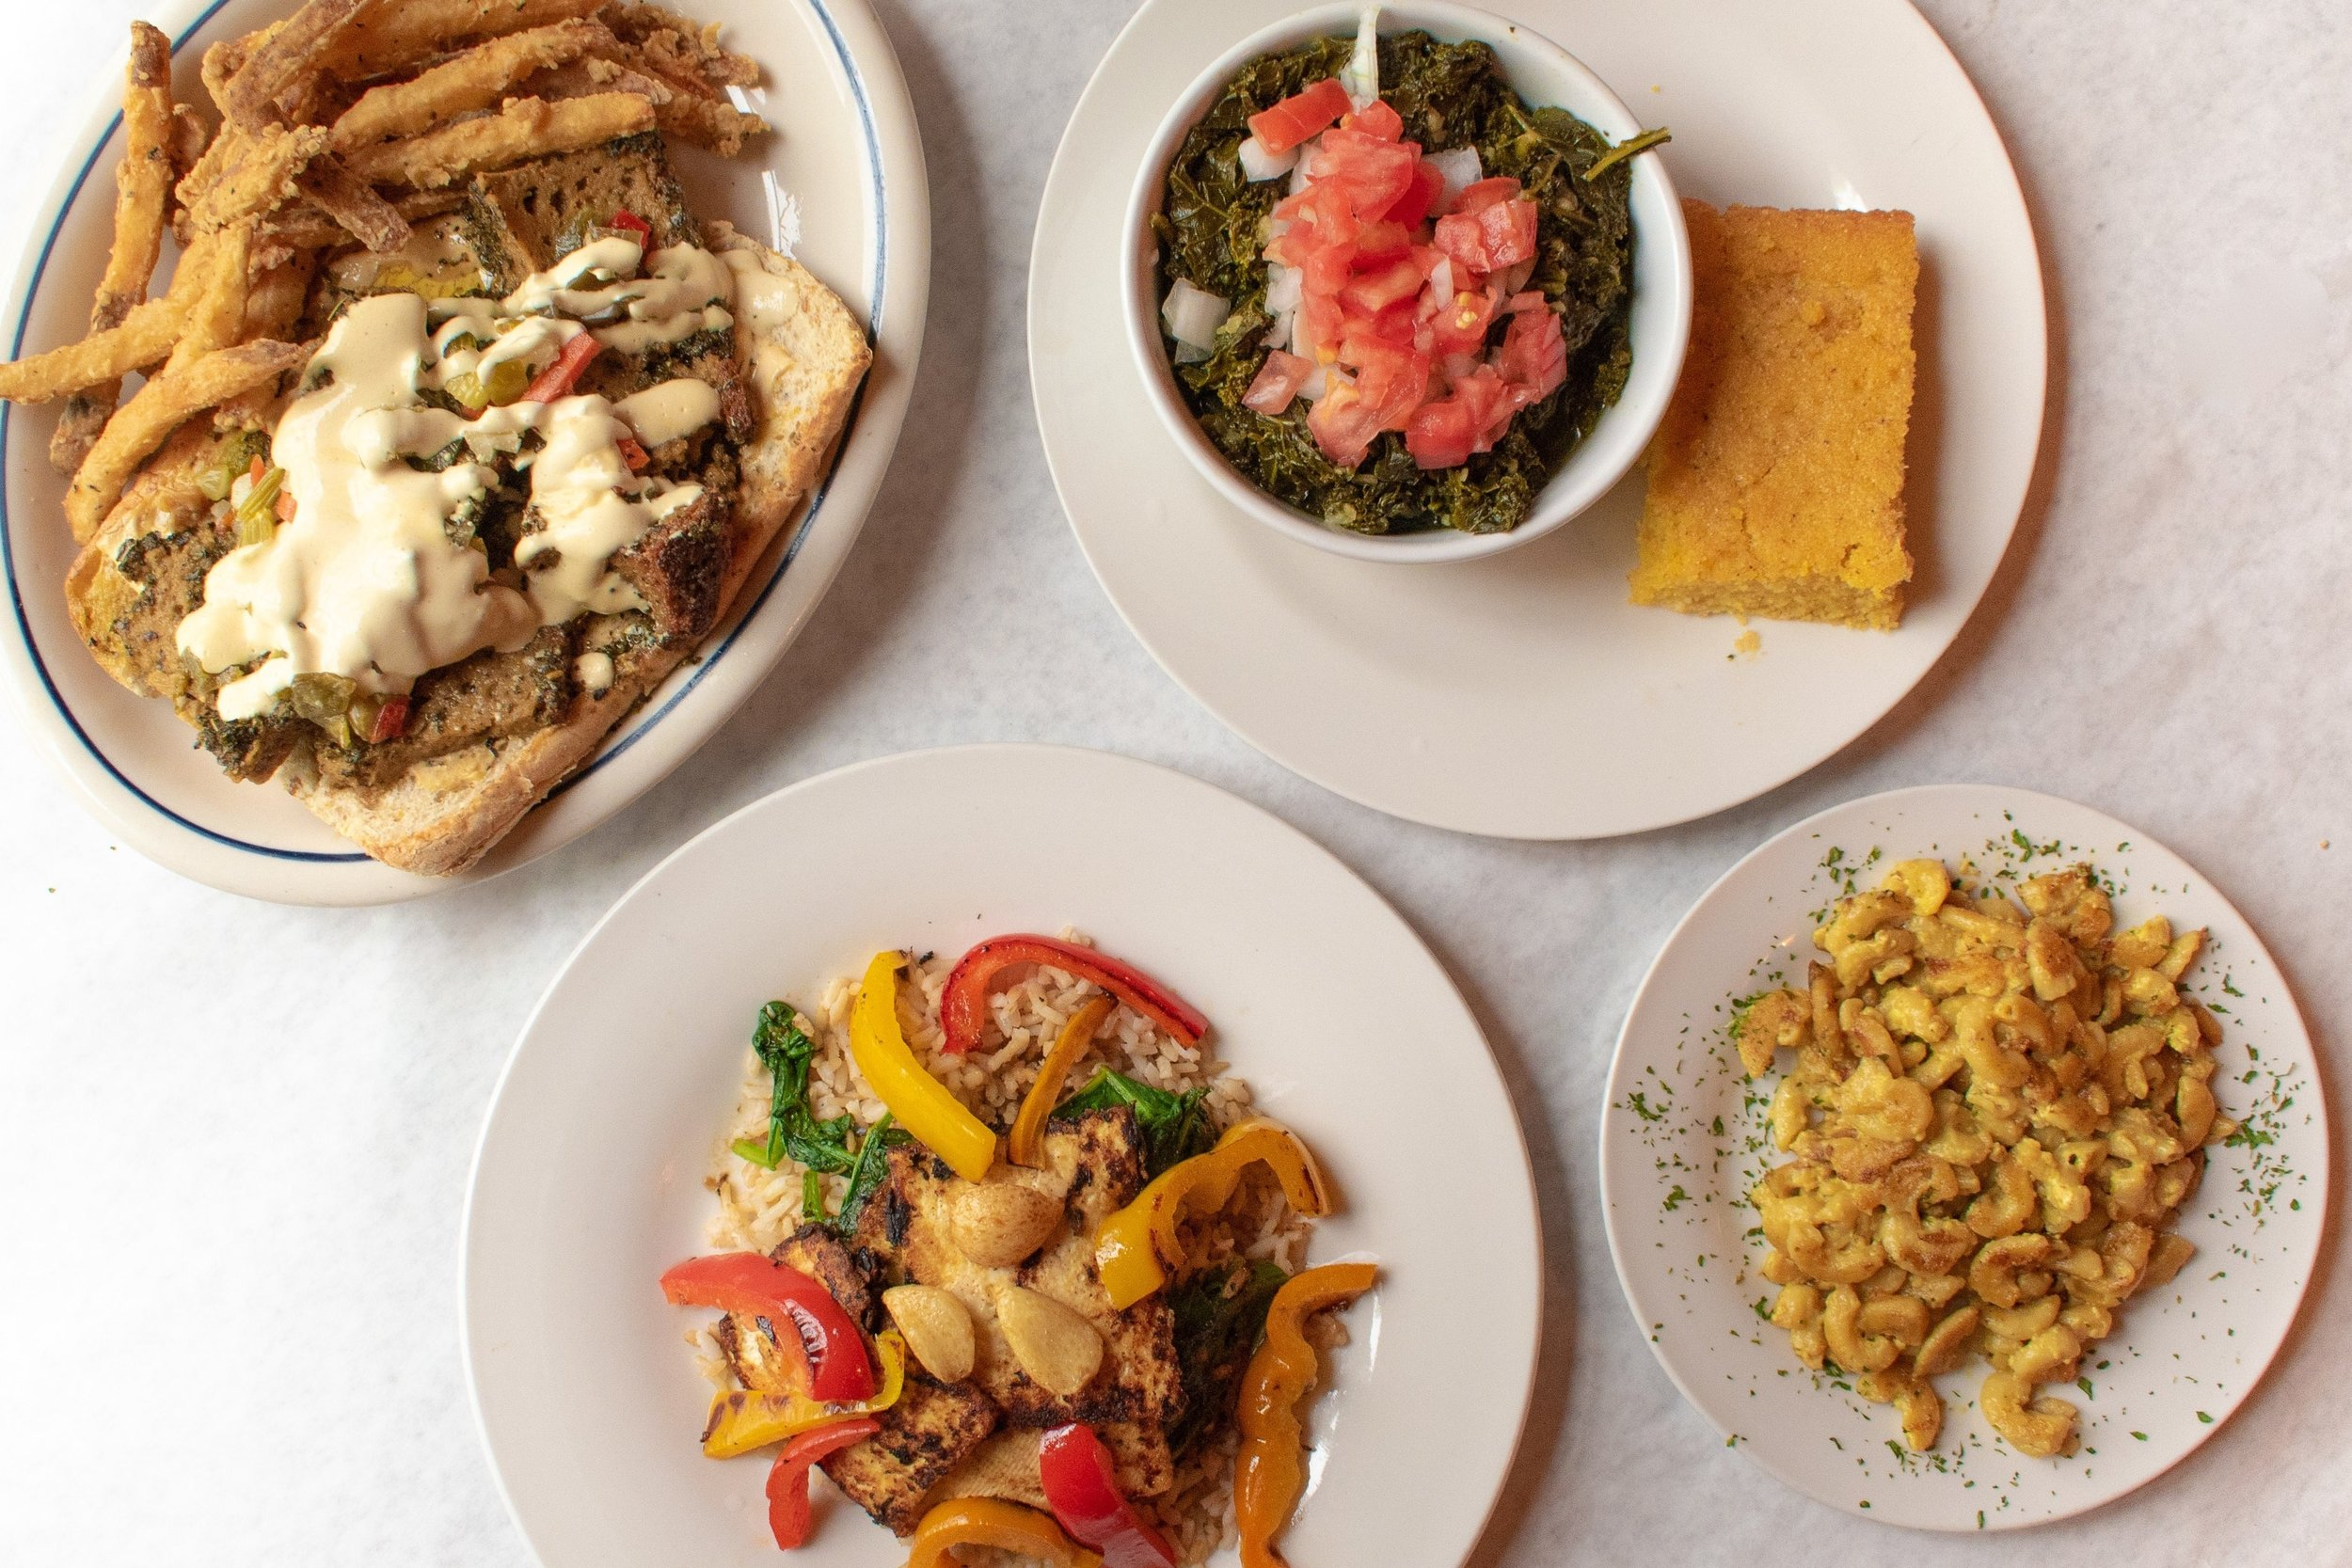 uprooted-traveler-vegan-food-guide-chicago-soul-vegetarian-southern.jpg